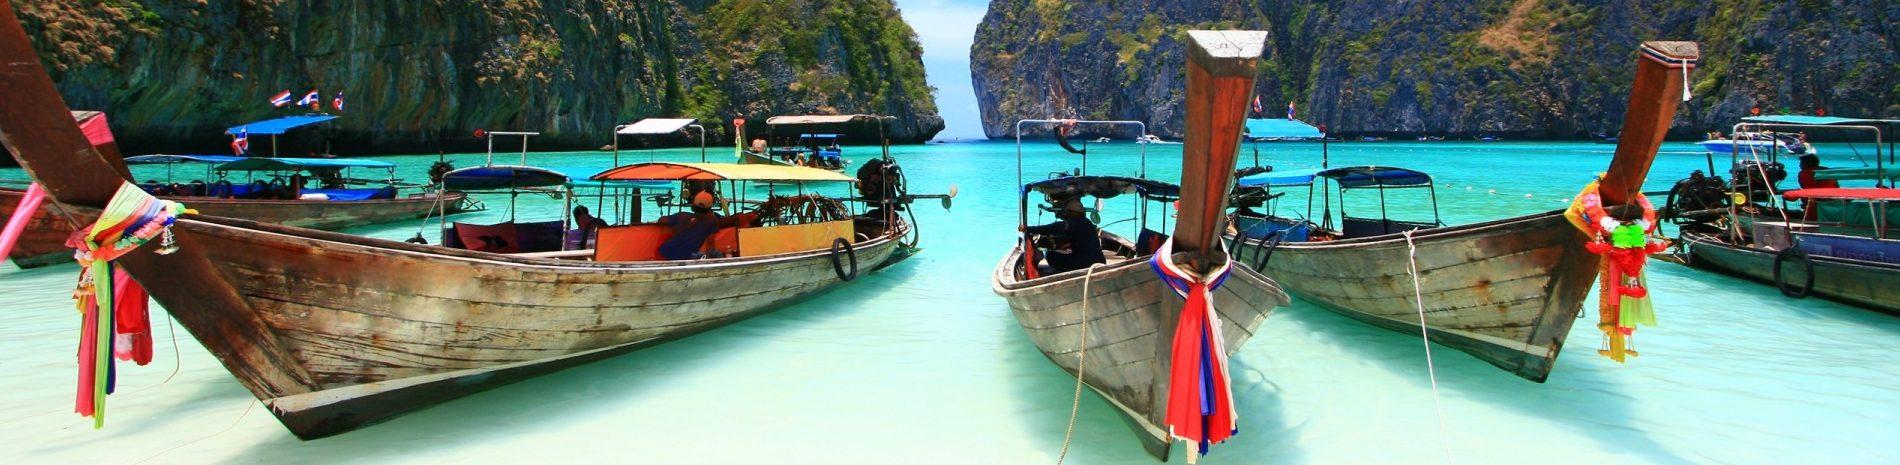 Phi-Phi-Island-1920x1080